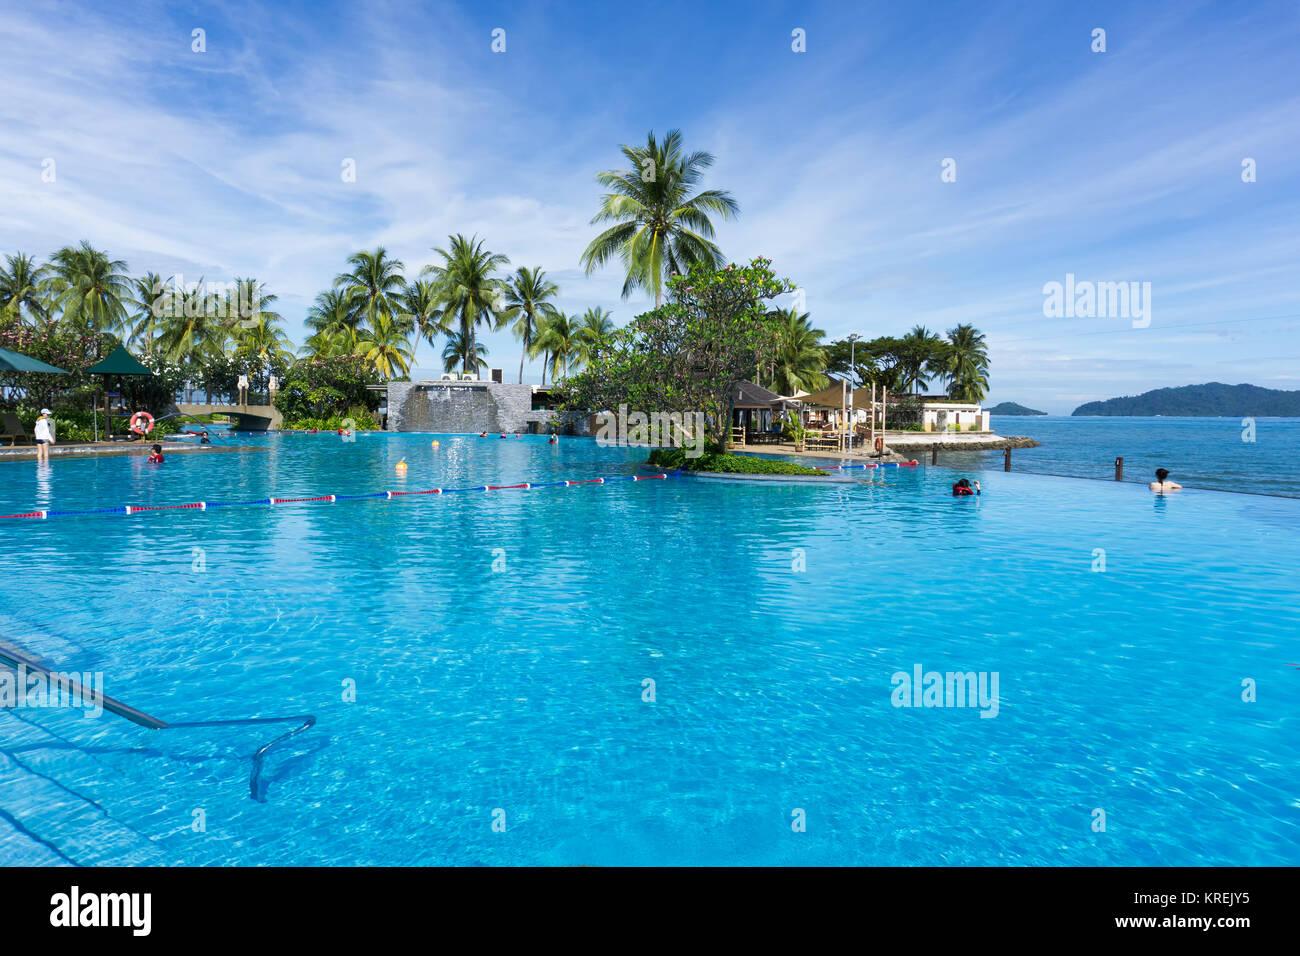 Kota Kinabalu, Malaysia - February 18, 2017: Beautiful infinity pool at Shangri-La Hotel and Resort in Sabah Borneo, - Stock Image